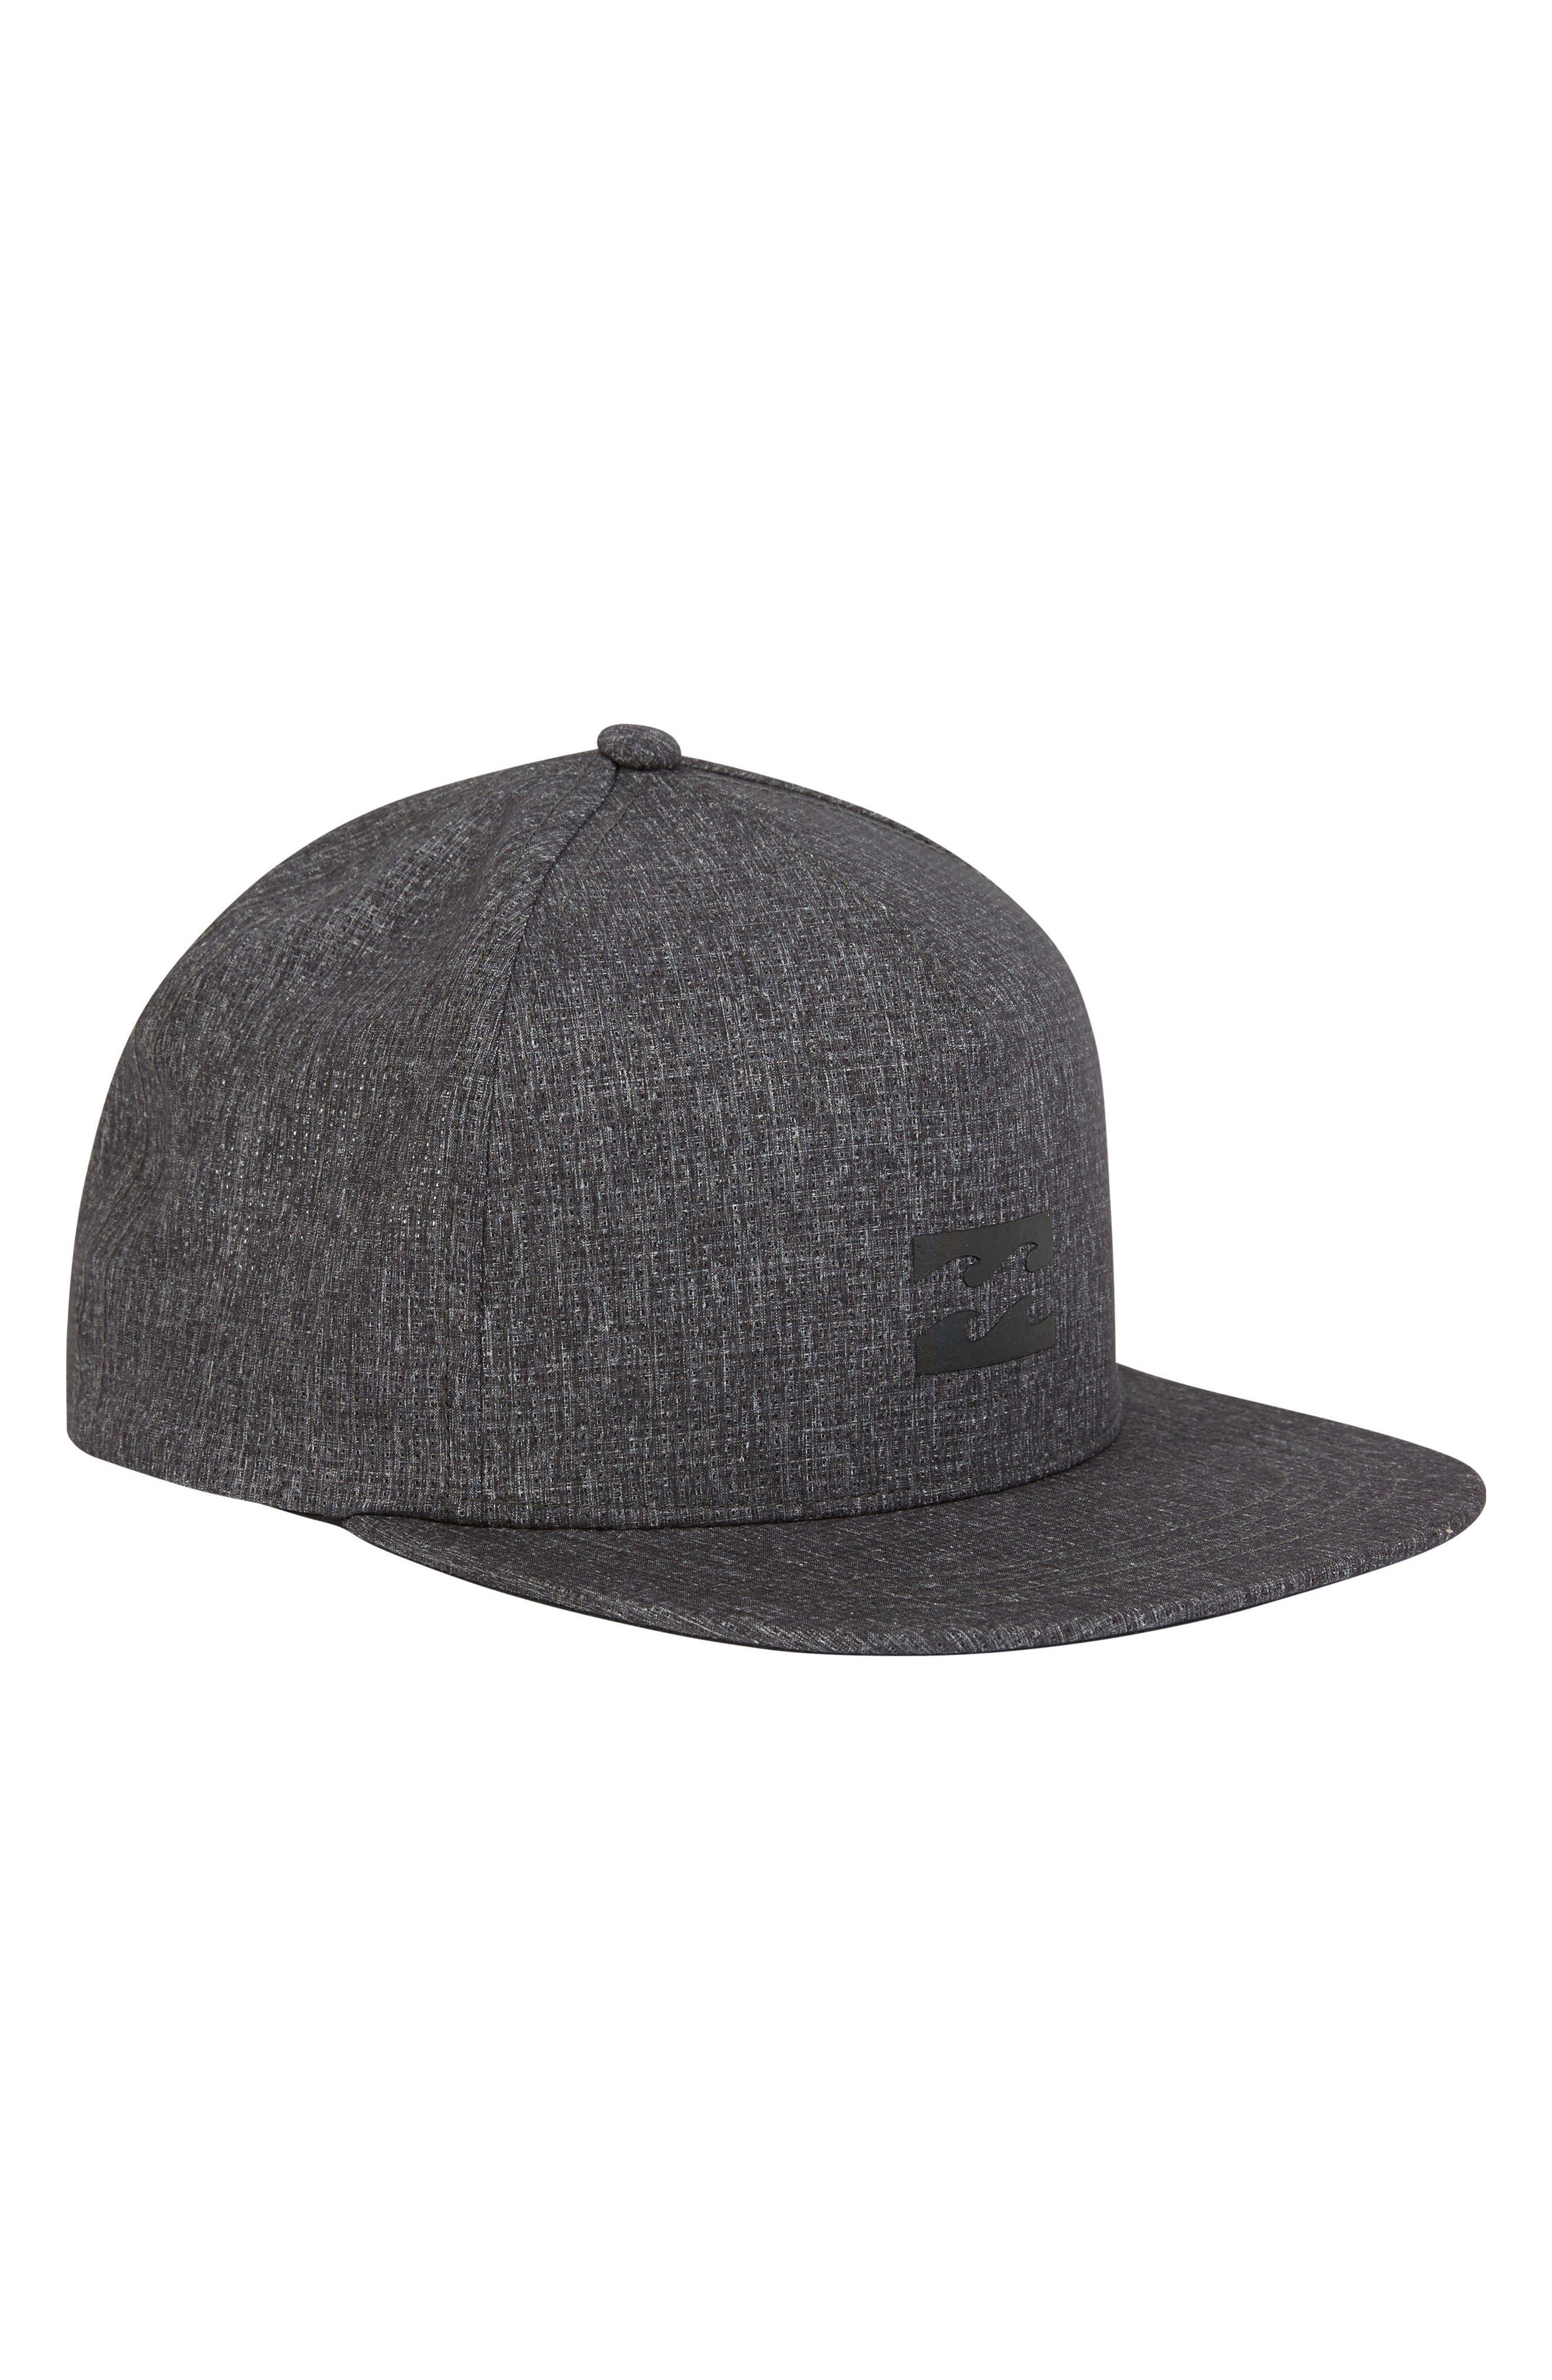 Surftrek Trucker Hat,                         Main,                         color, BLACK HEATHER